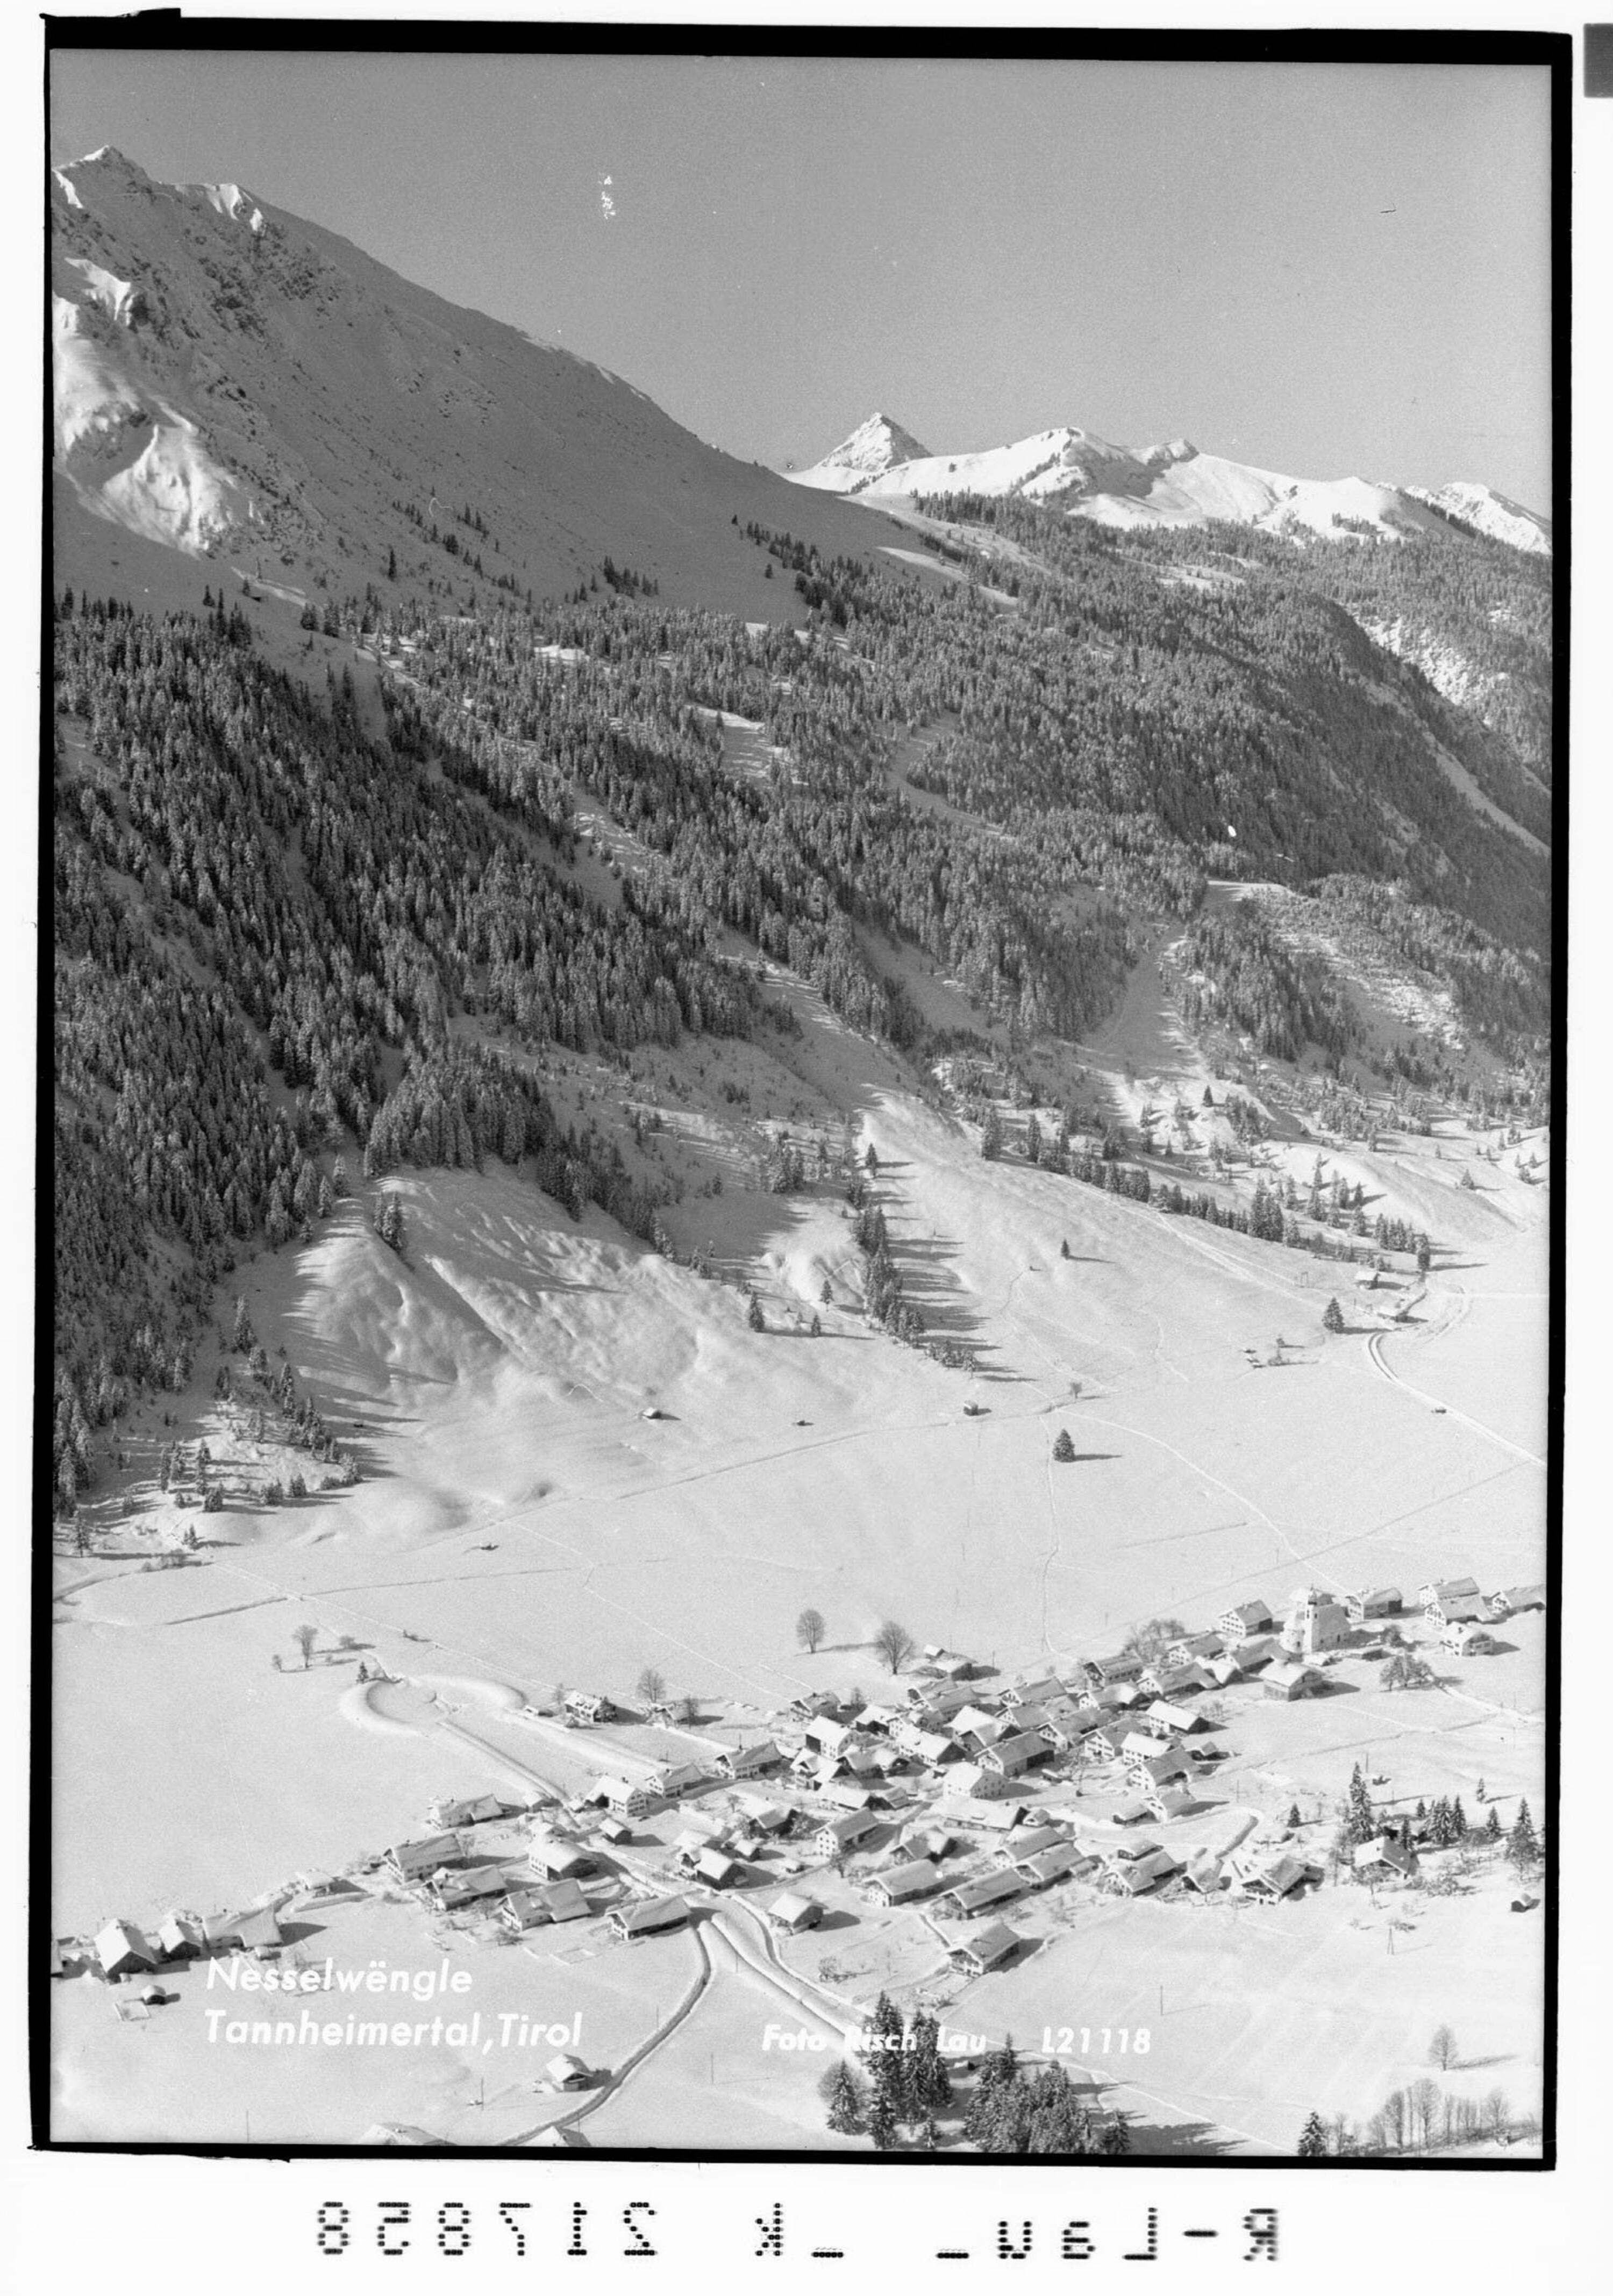 Nesselwängle Tannheimertal, Tirol von Risch-Lau